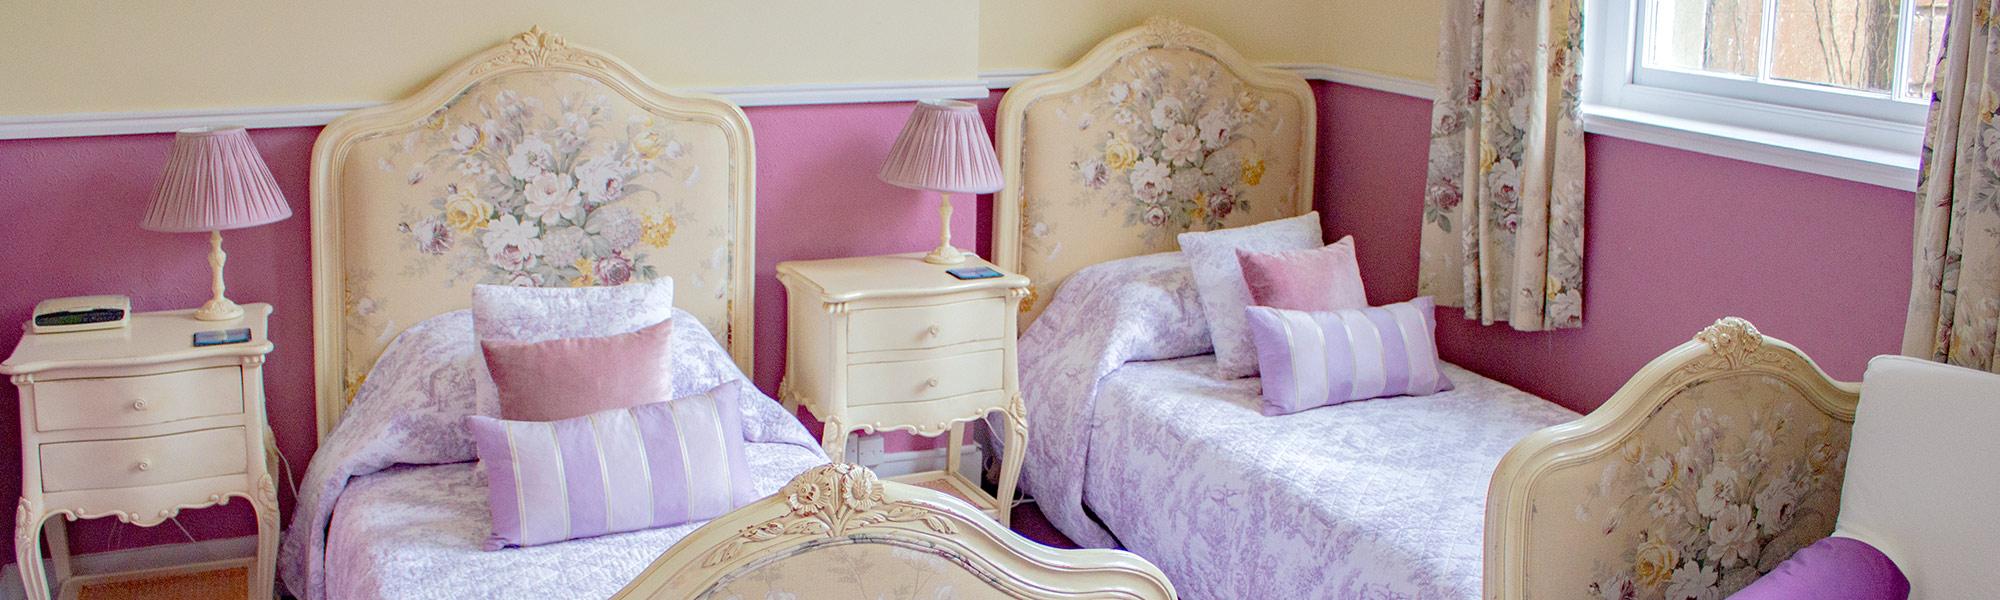 IMG_3964 Bedroom 2000x600